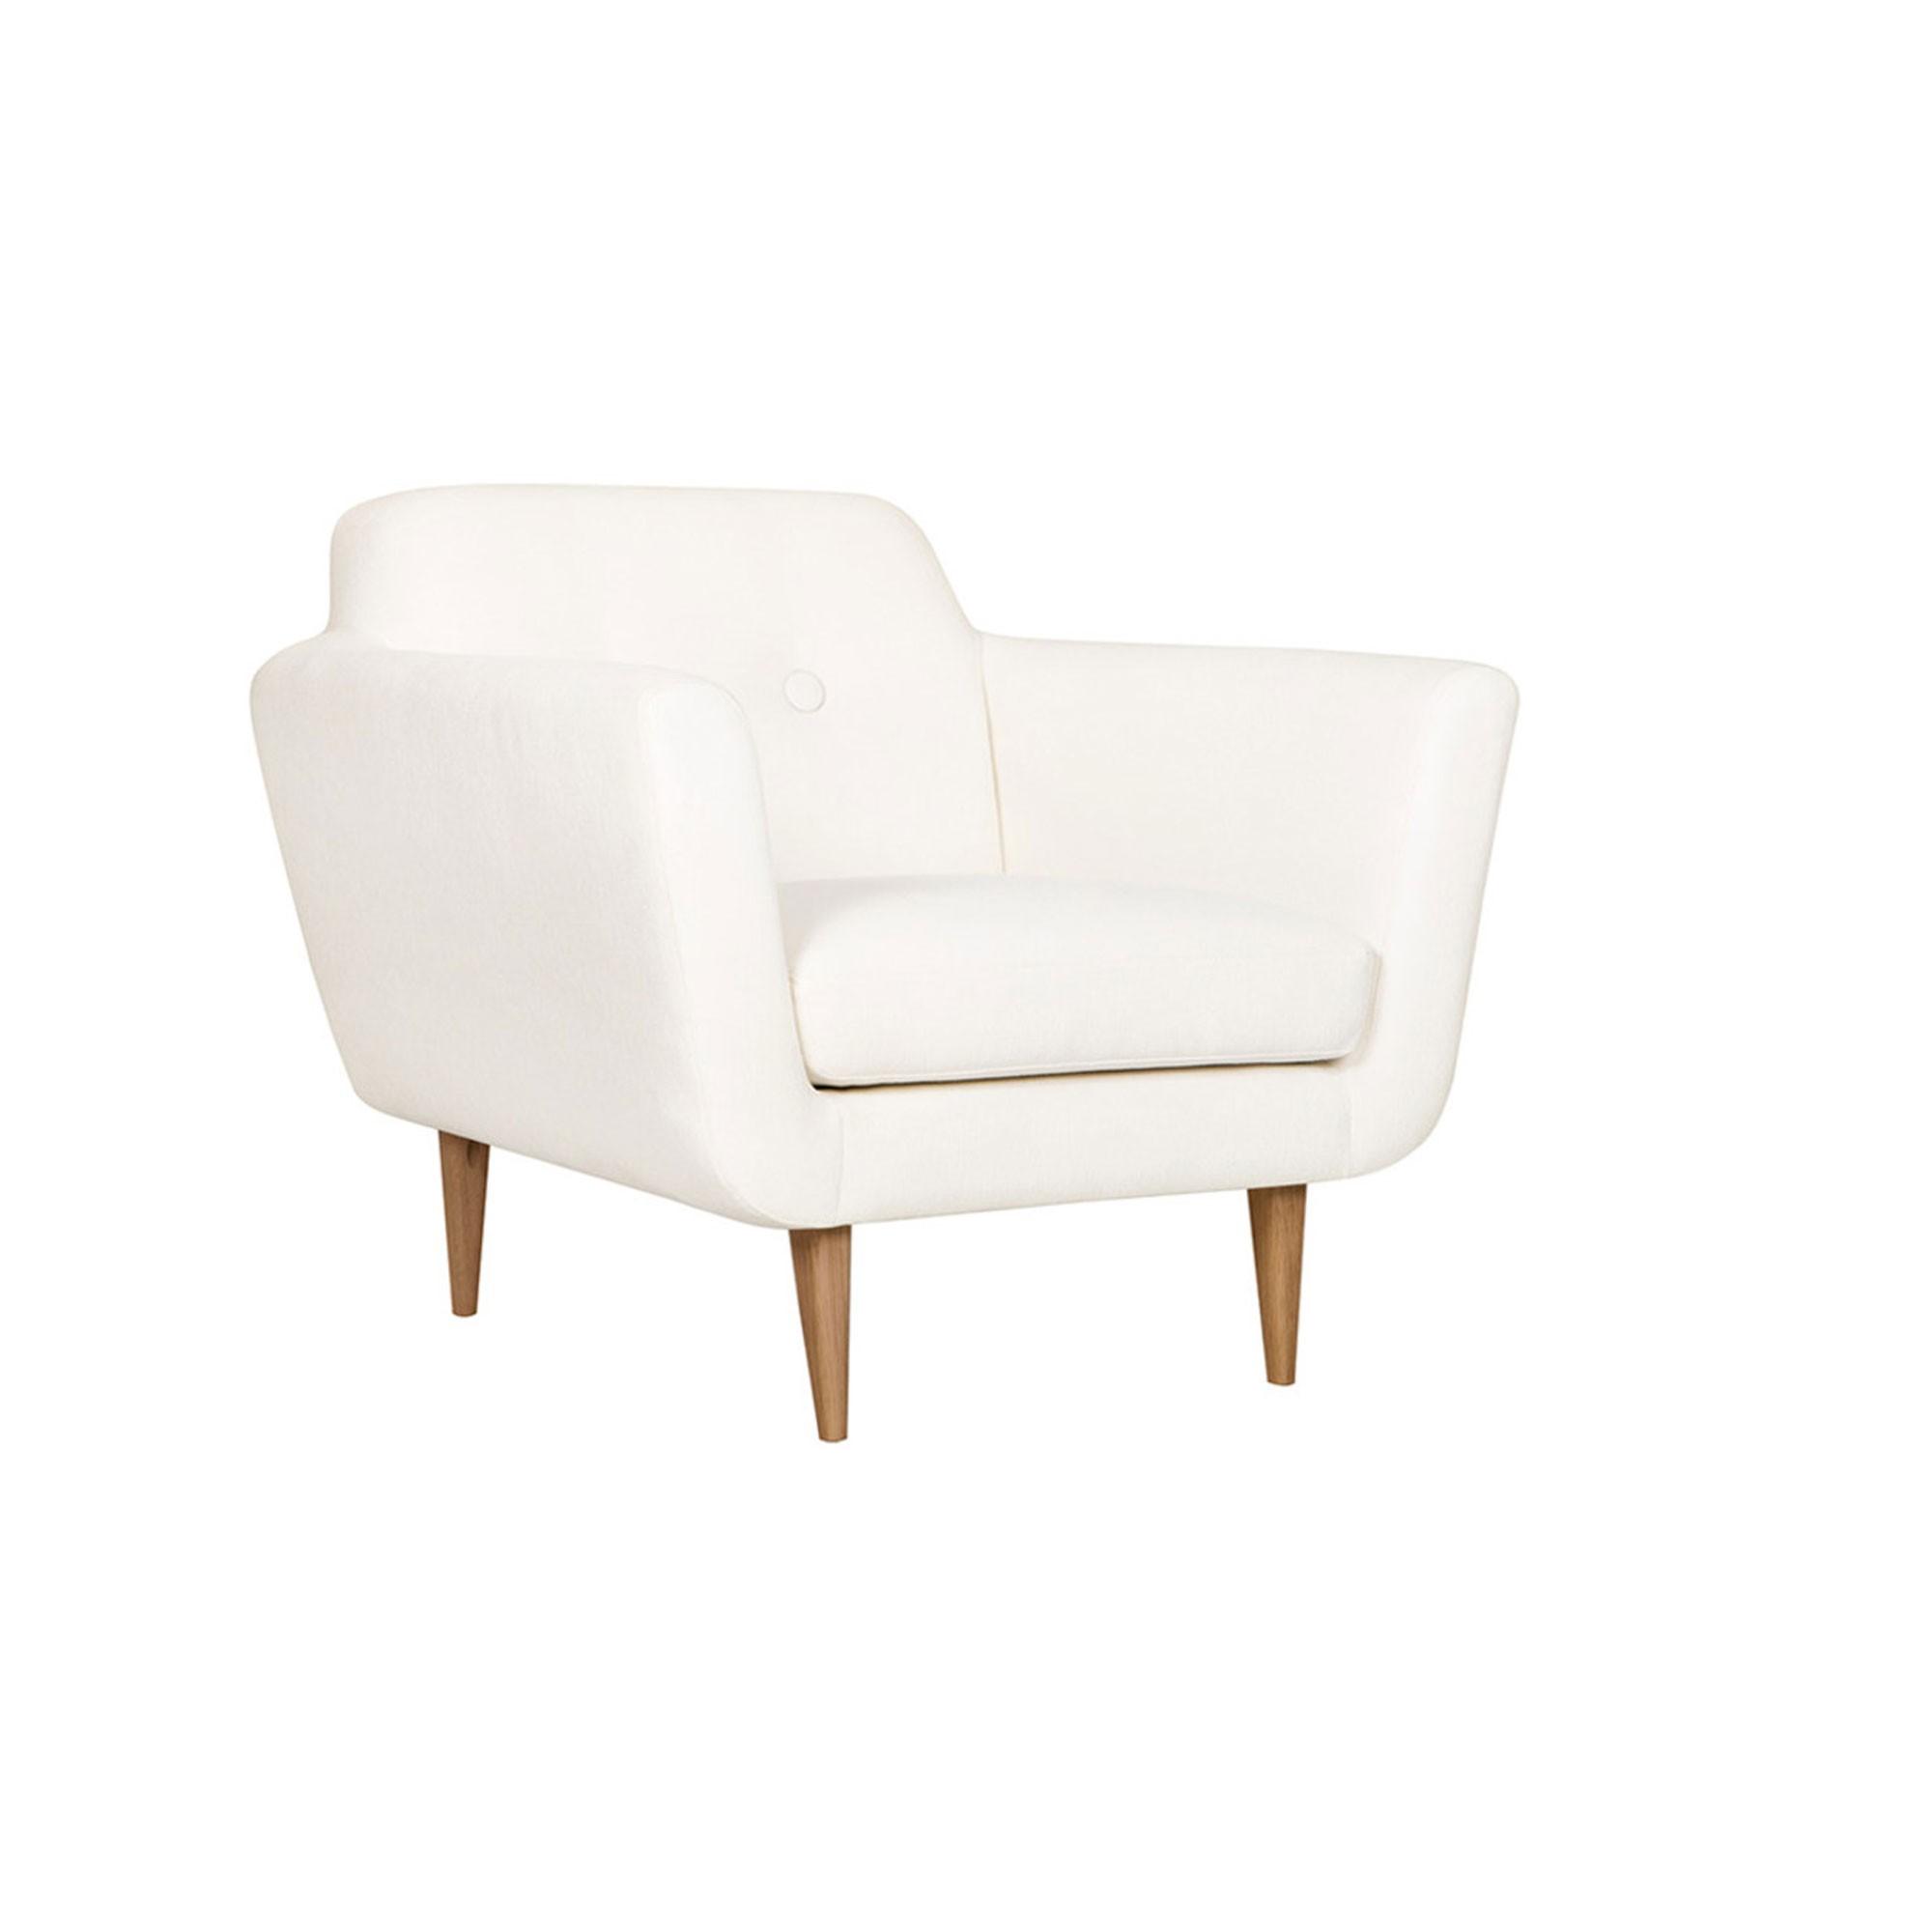 Style Années 50 Otto Cassé Fauteuil Sits Blanc nwZ0kNPX8O